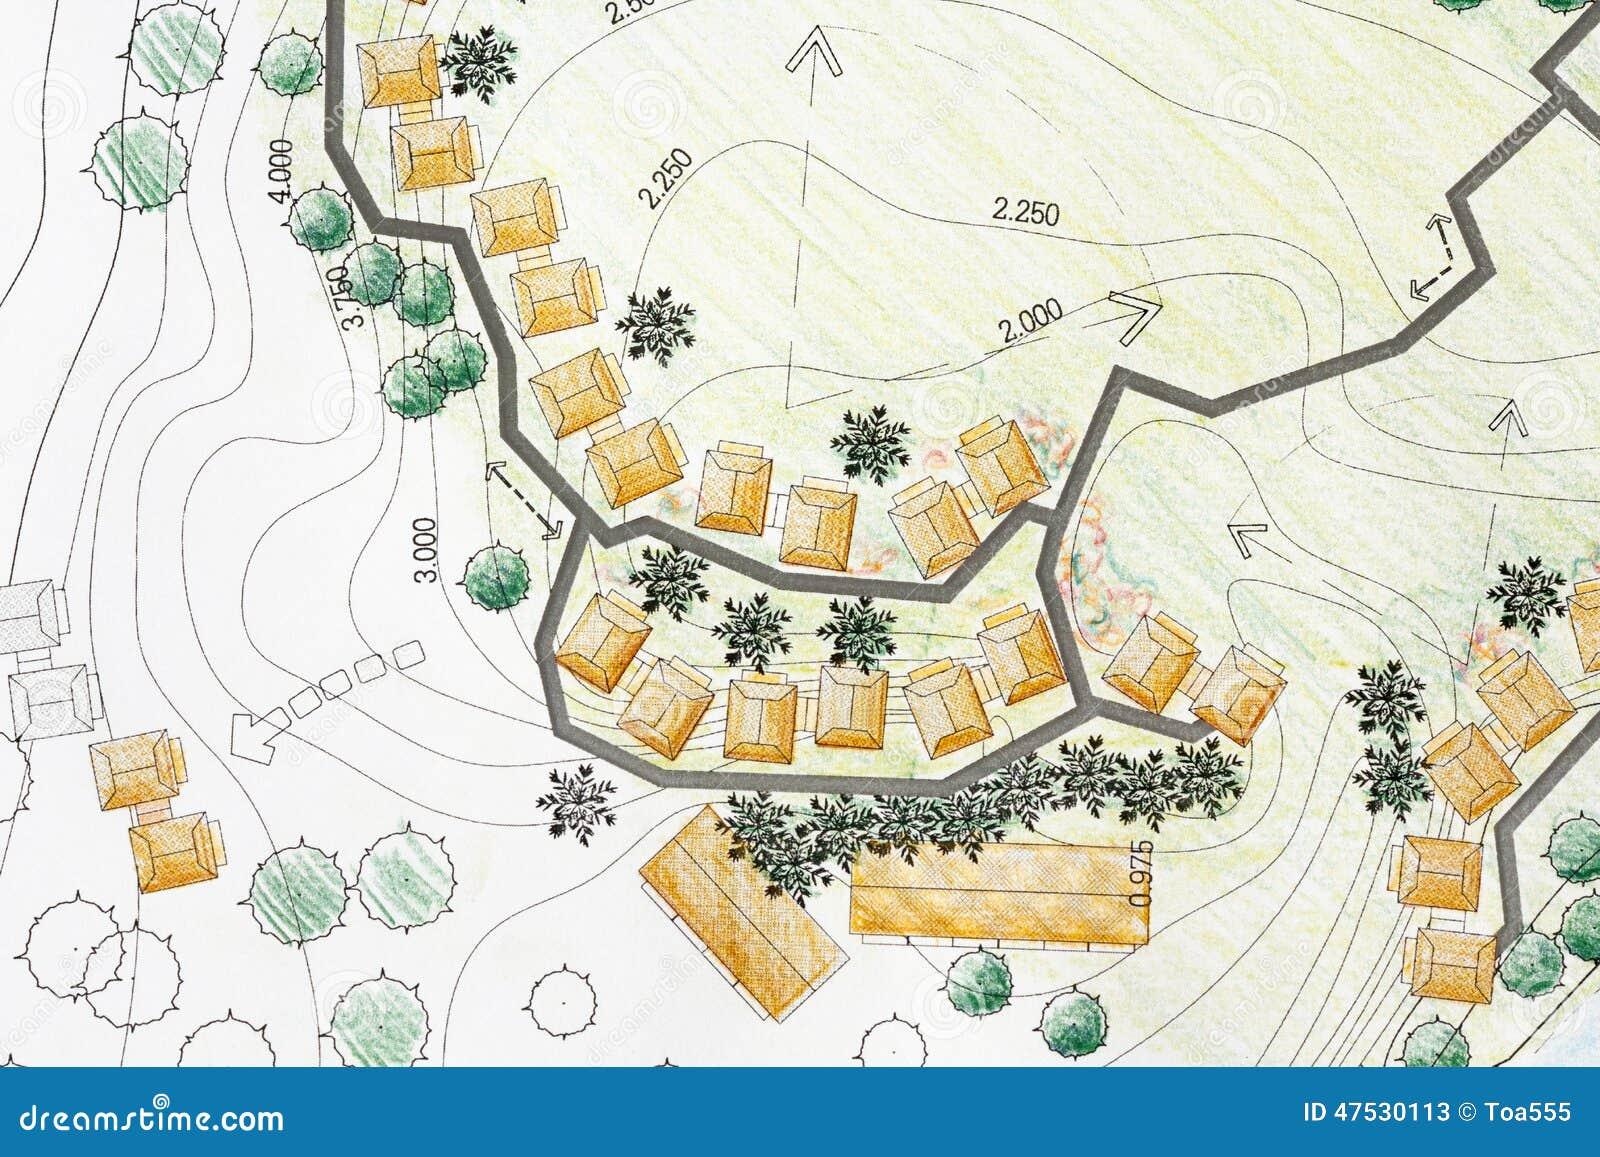 Landscape Architect Designing On Site Analysis Plan Stock